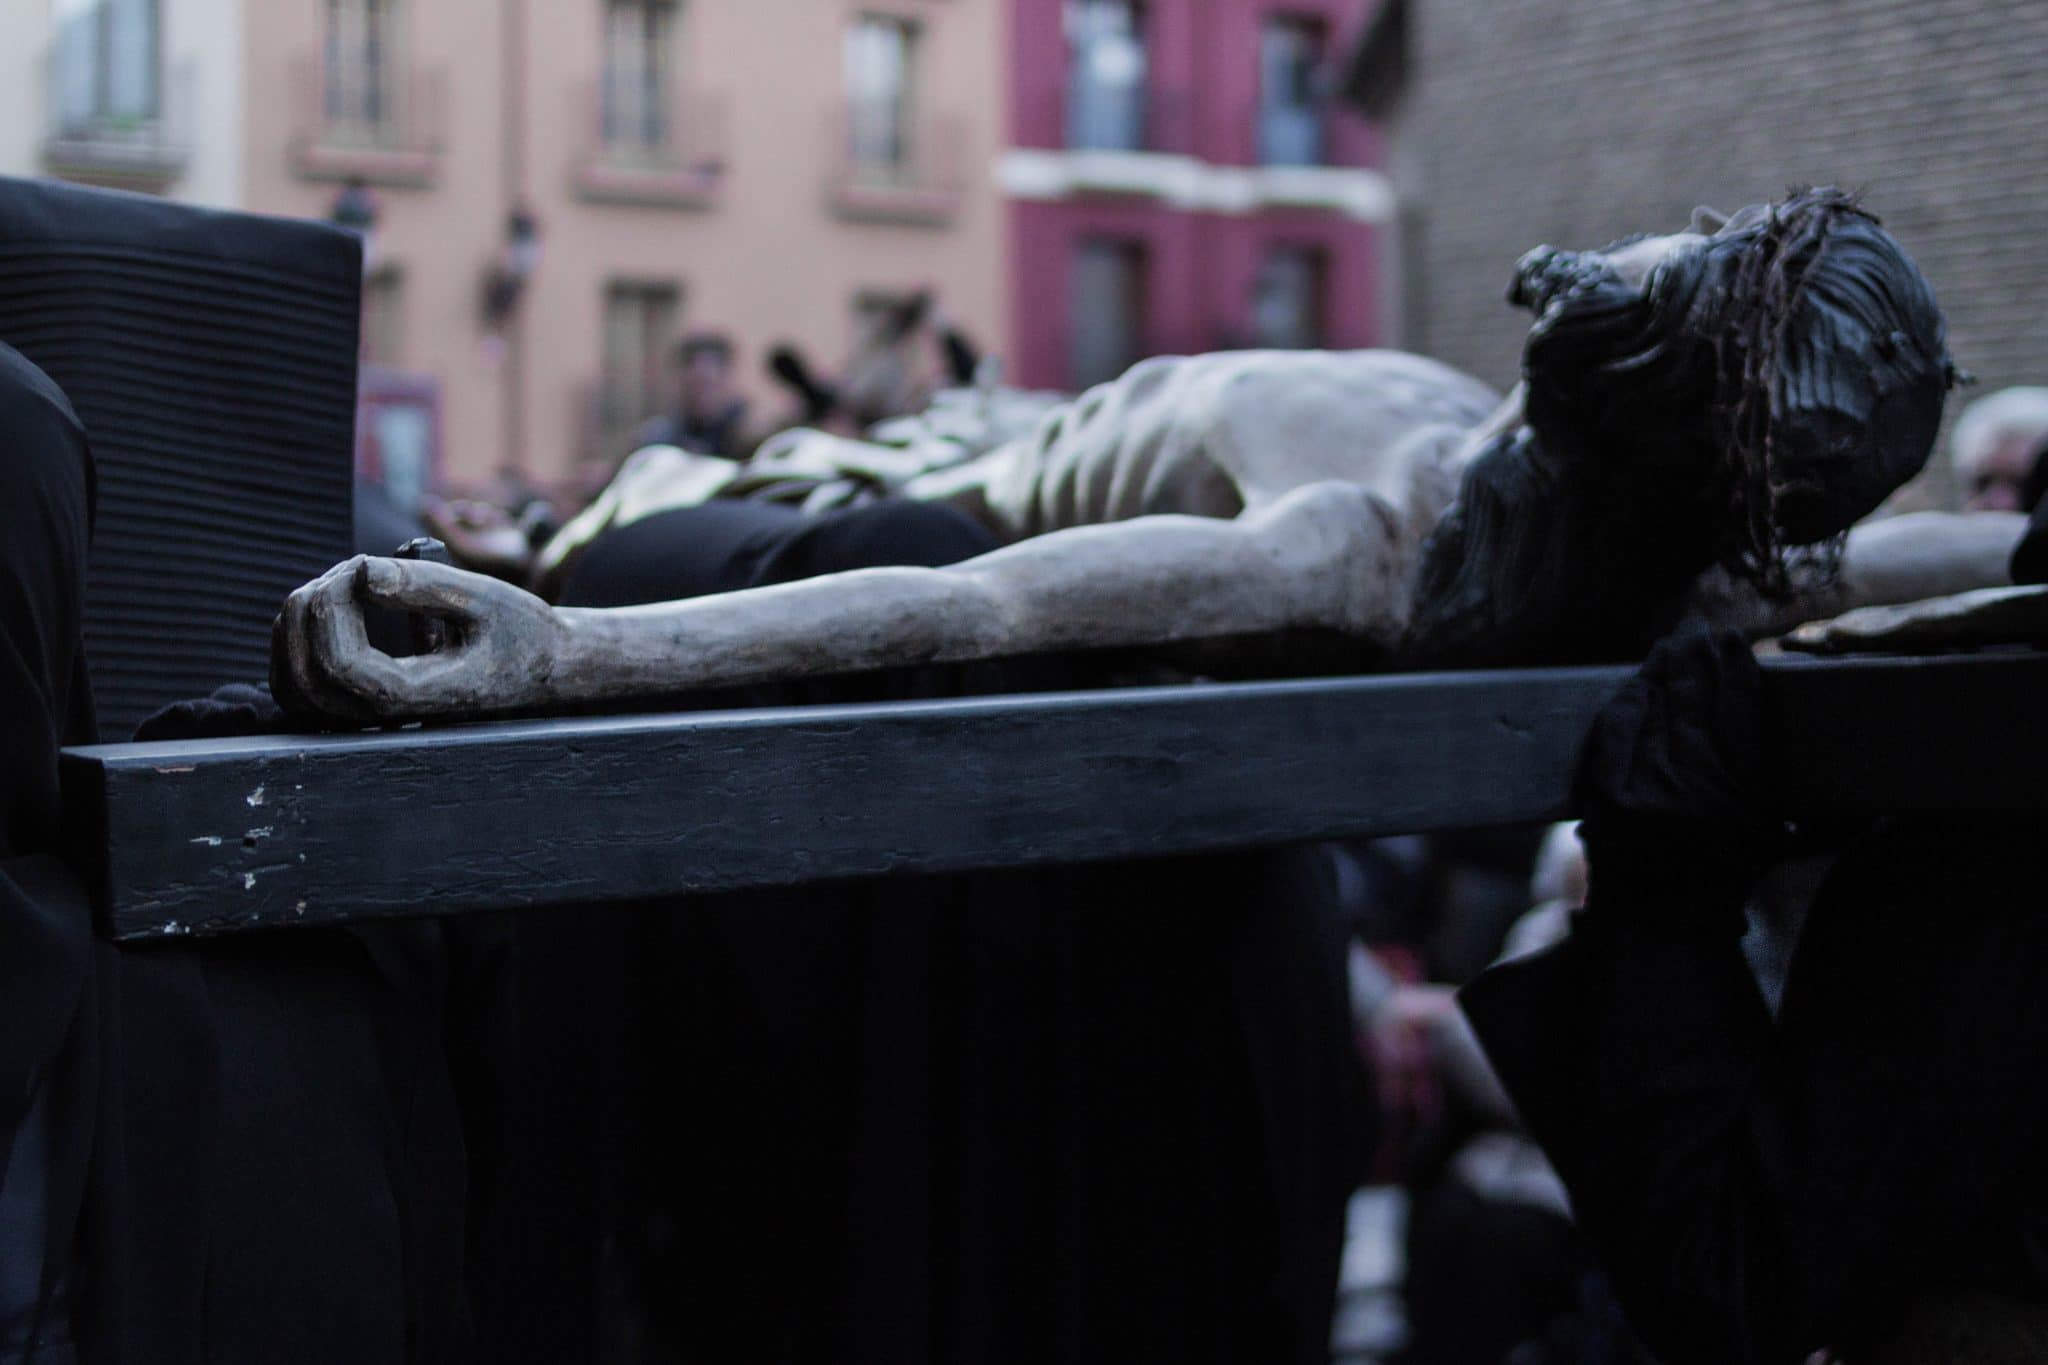 Semana Santa en Zaragoza - Via Crucis Parroquial Silencio-Esclavas